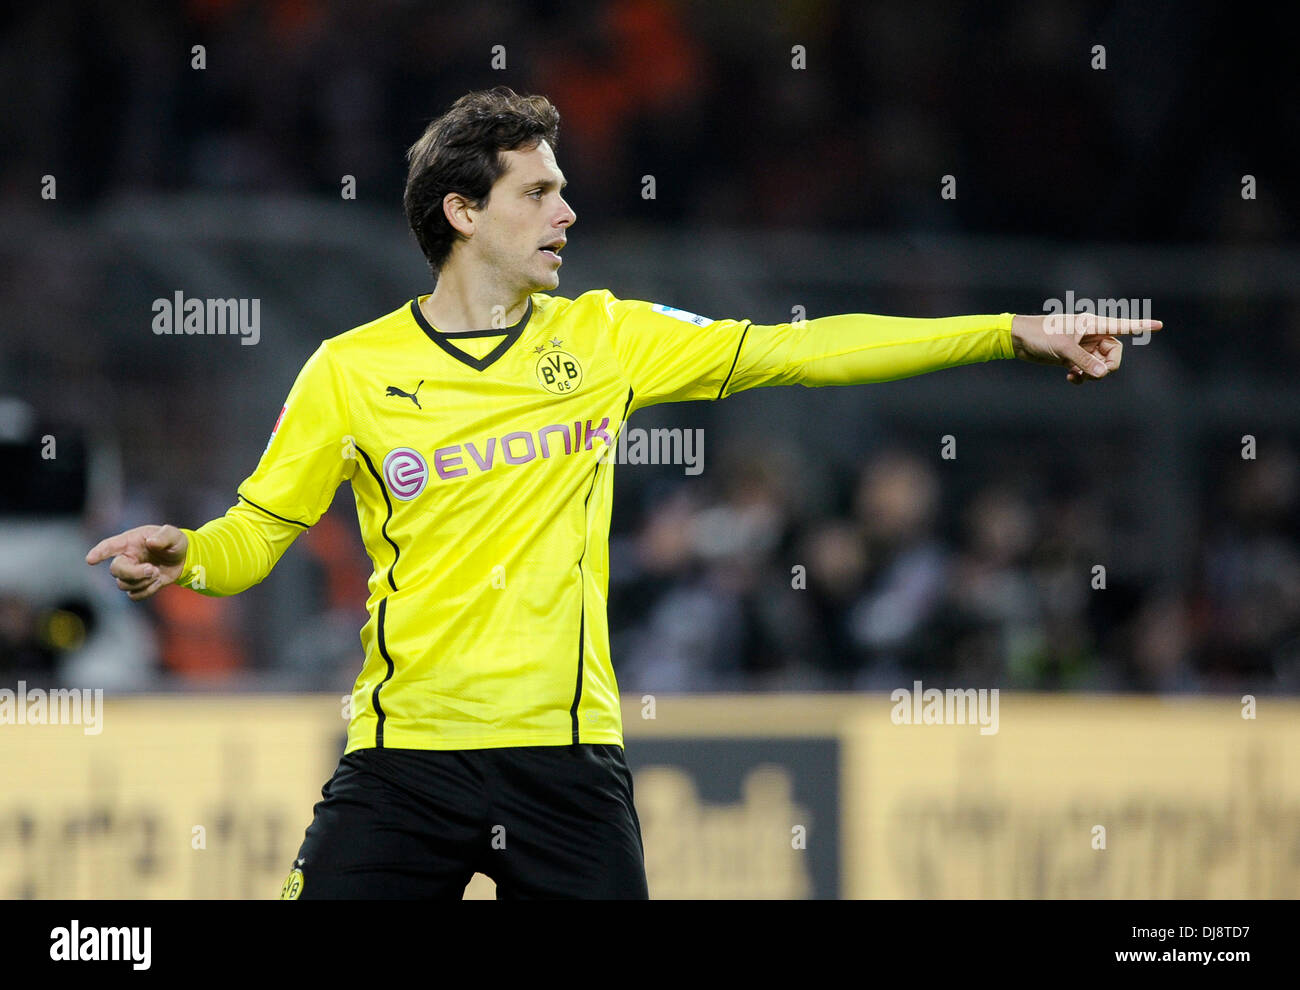 Dortmund, Germany November 23rd 2013, German Football Bundesliga Season 2013/14 matchday 13, Borussia Dortmund (BVB) vs.  FC Bayern Munich (Muenchen, Munchen, FCB) 3:0 --- Manuel Friedrich (BVB) - Stock Image